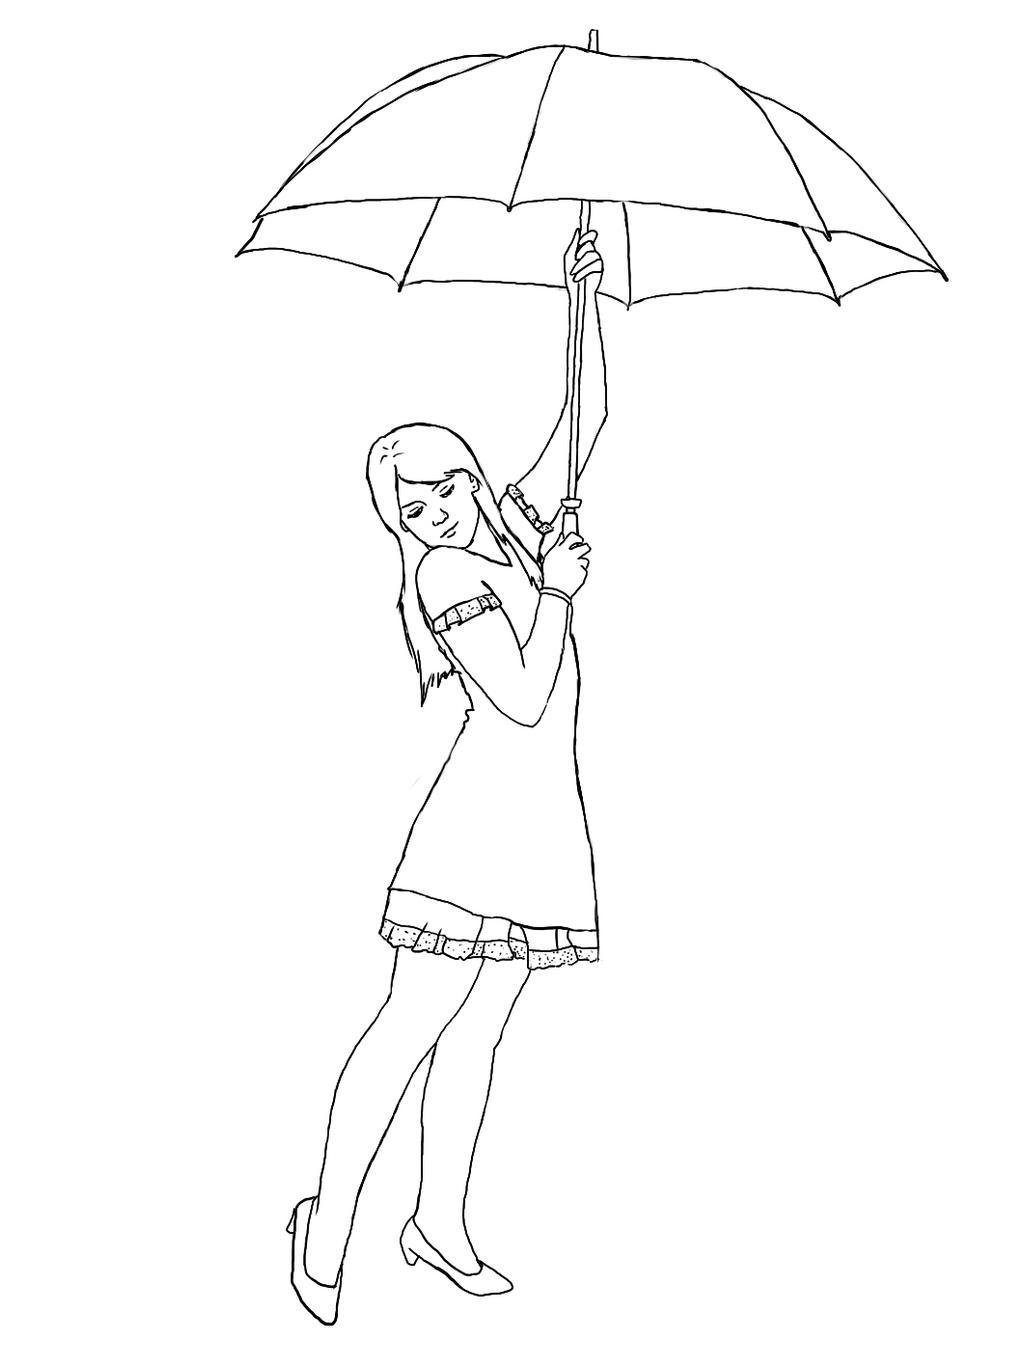 Line Art Umbrella : Umbrella lineart by akumaryoshi on deviantart